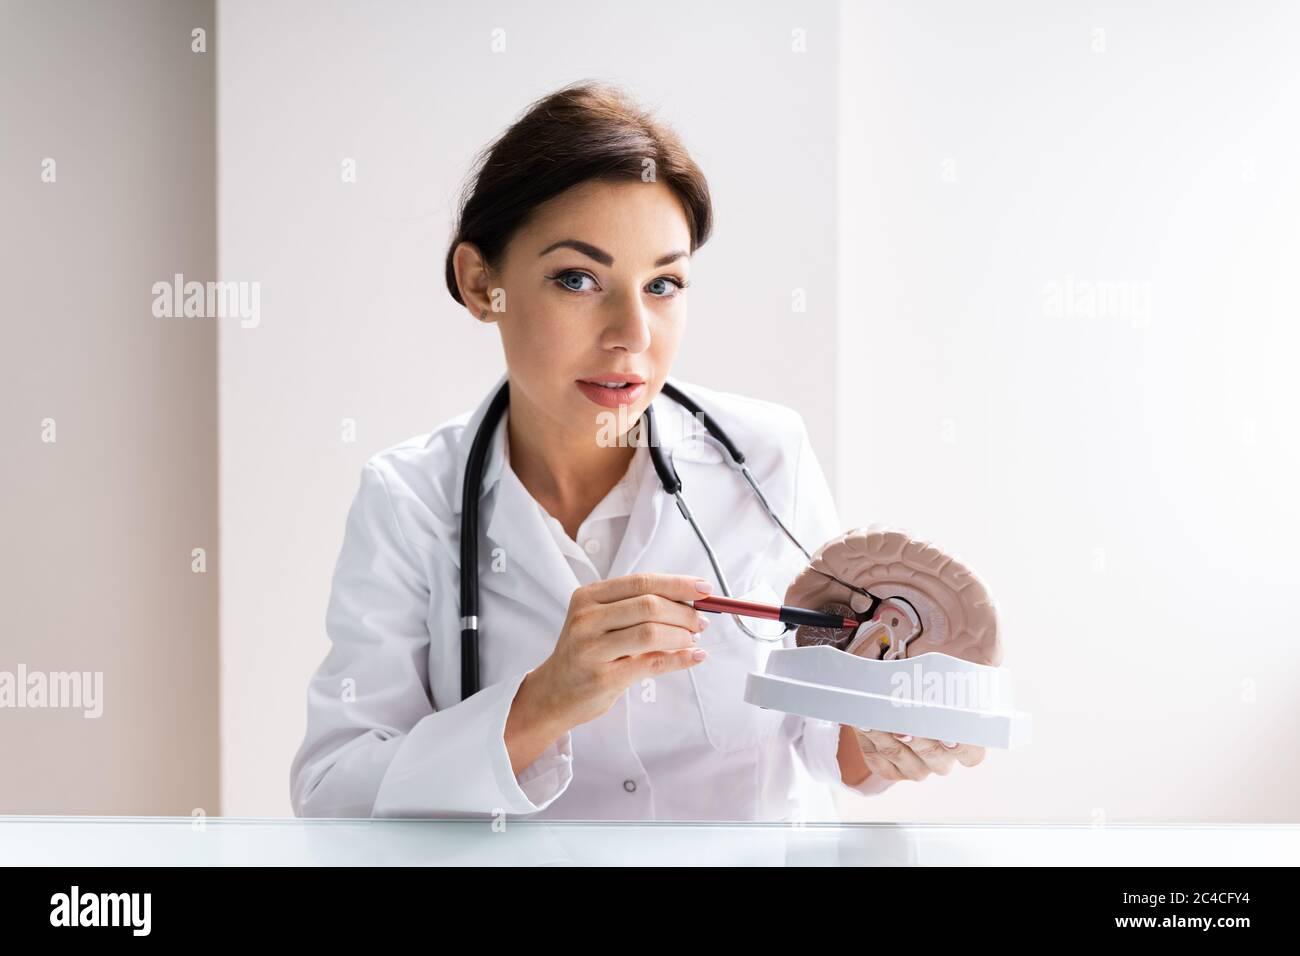 Brain Surgeon Or Neurologist Doctor Explaining To Patient Stock Photo